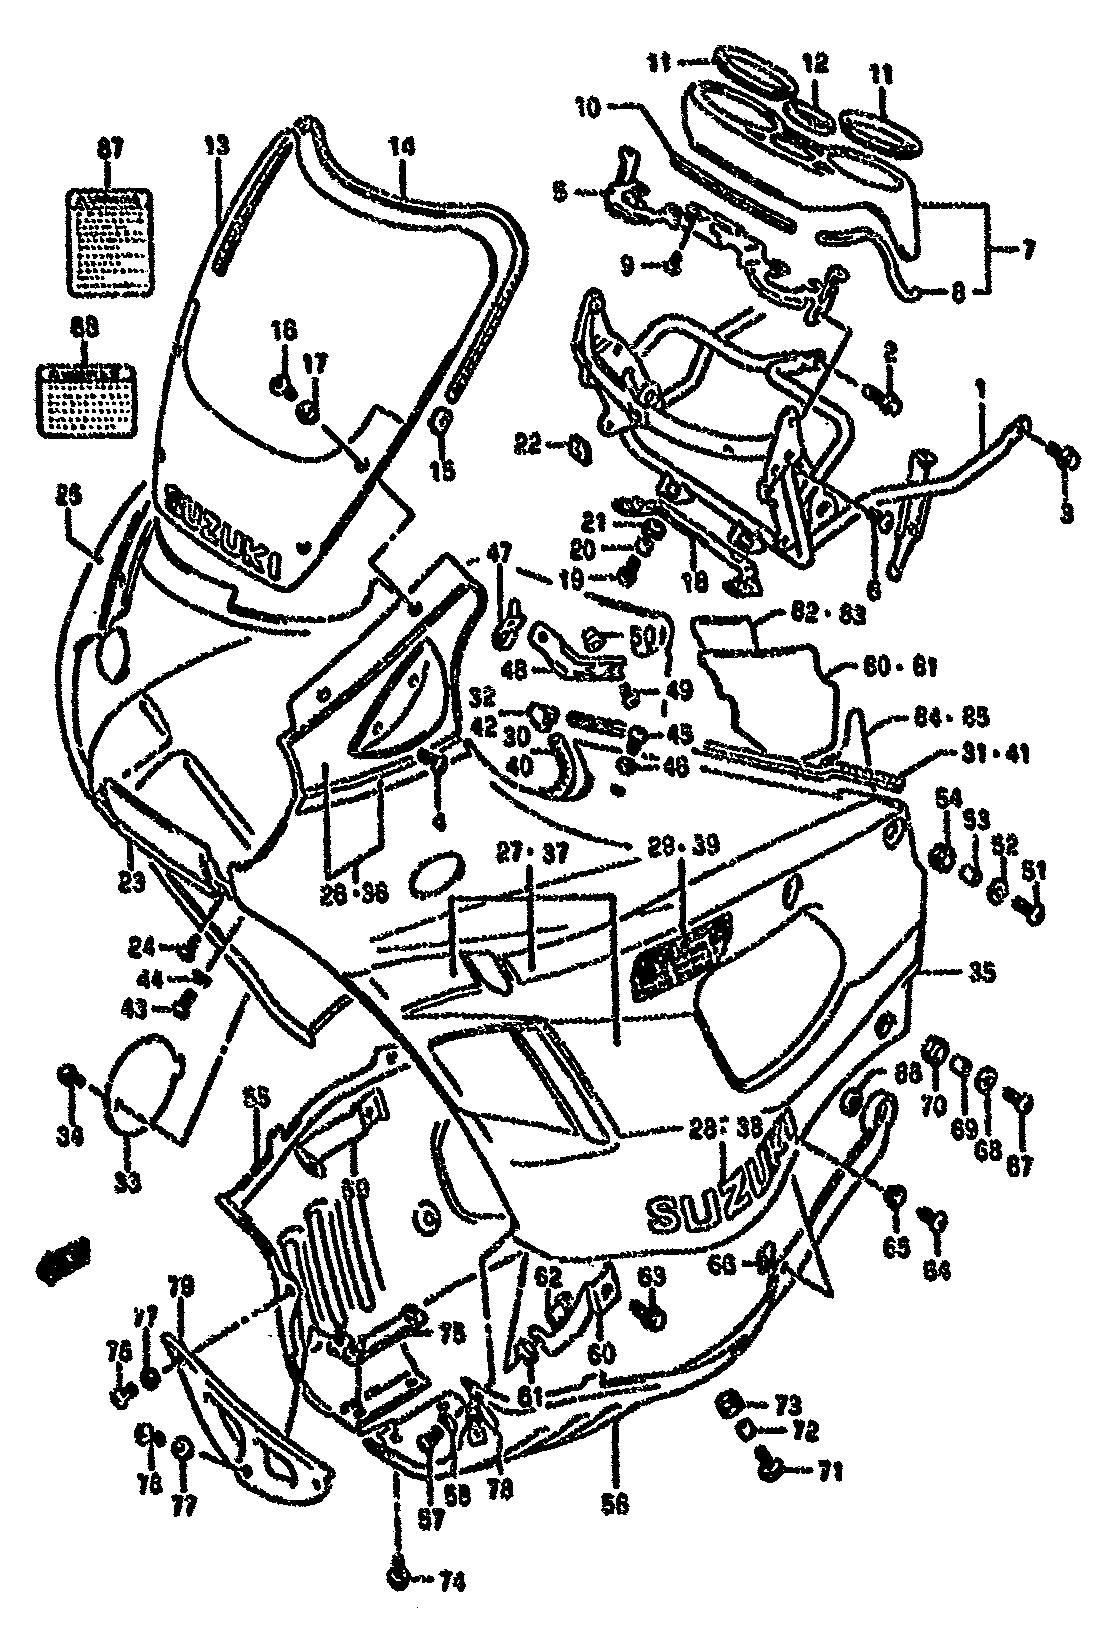 union carenado superior suzuki gsx f 750 1989